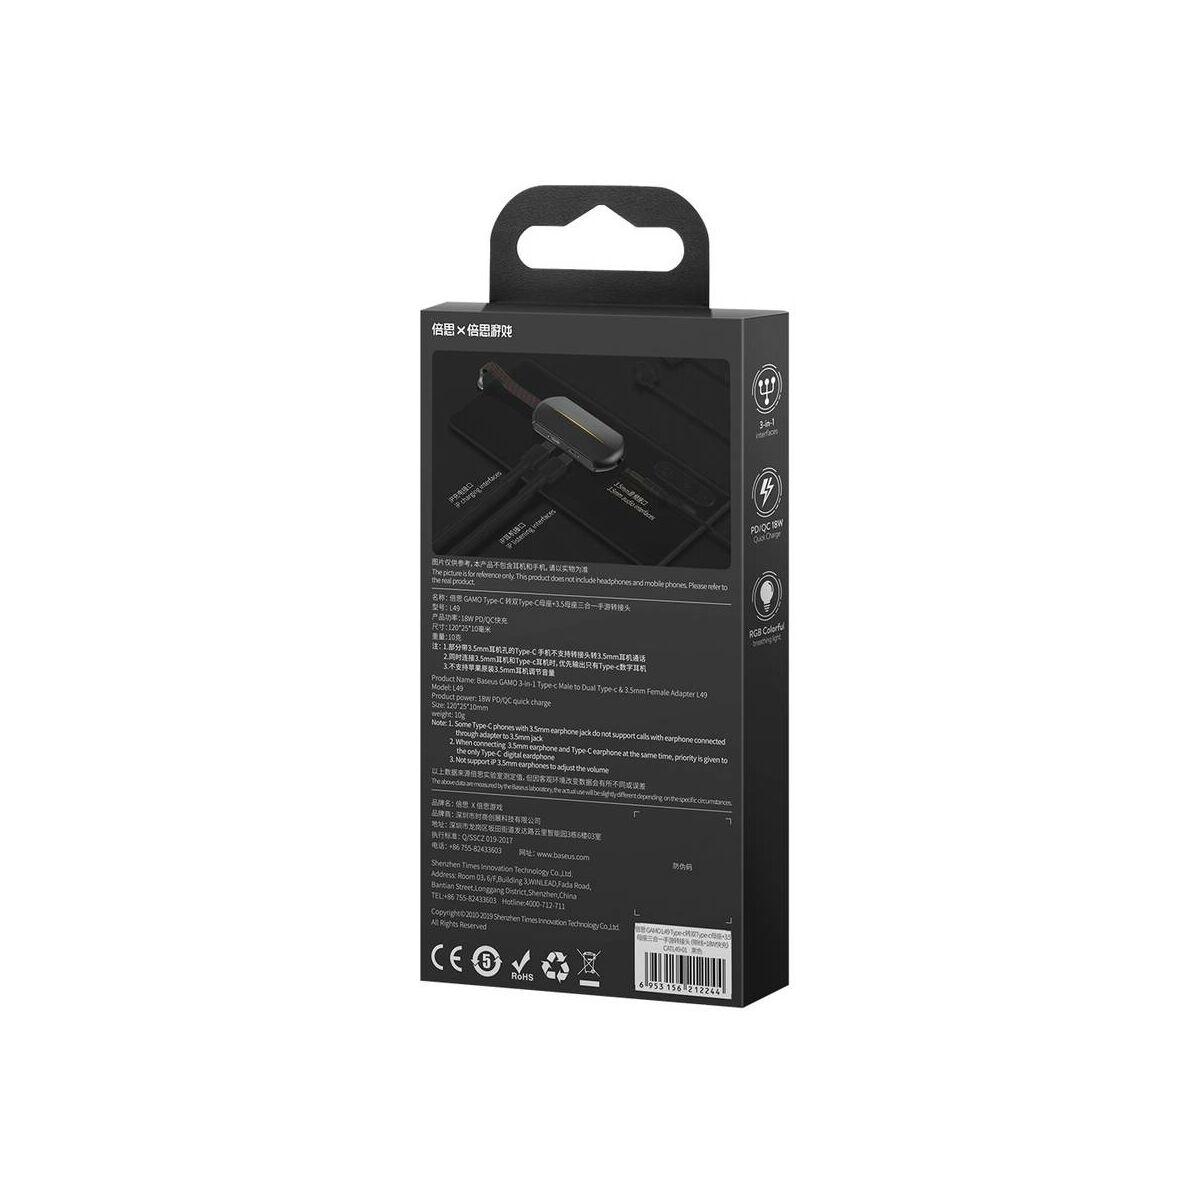 Baseus átalakító, L49 3-in-1 Type-C [apa] - Dual Type-C + 3.5 mm [anya] adapter, fekete (CATL49-01)